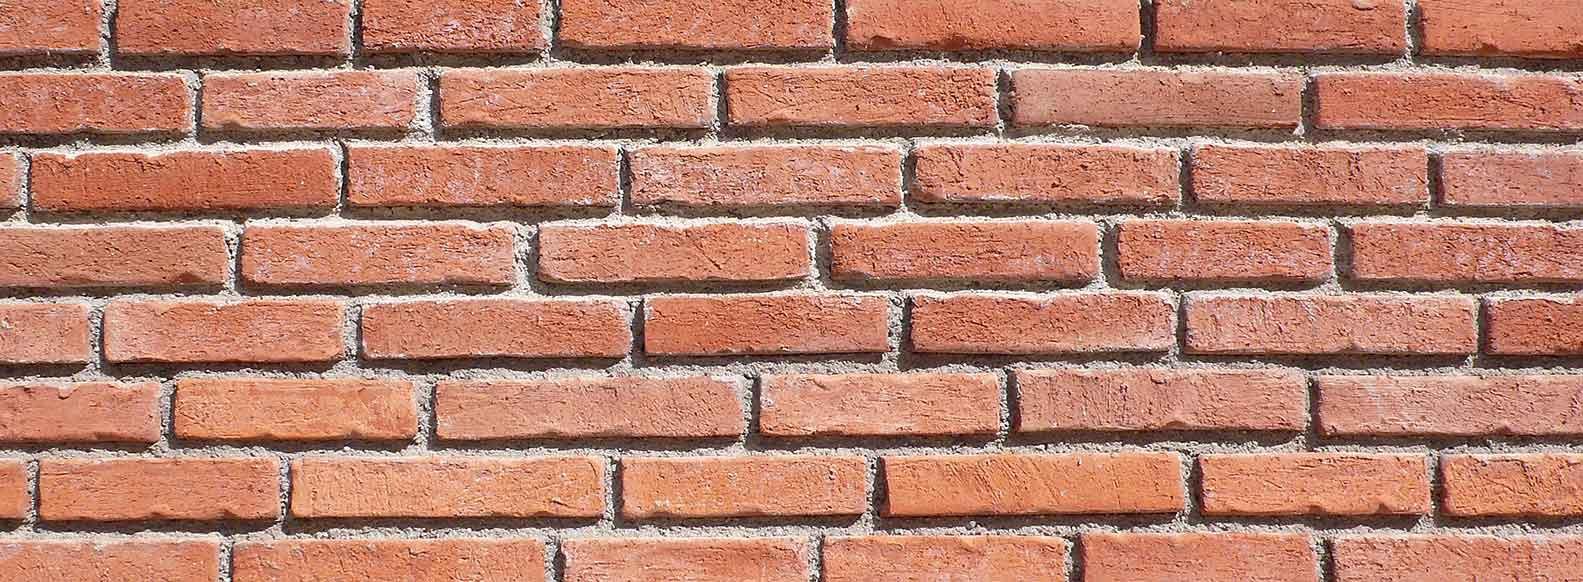 Perforated Stick Brick